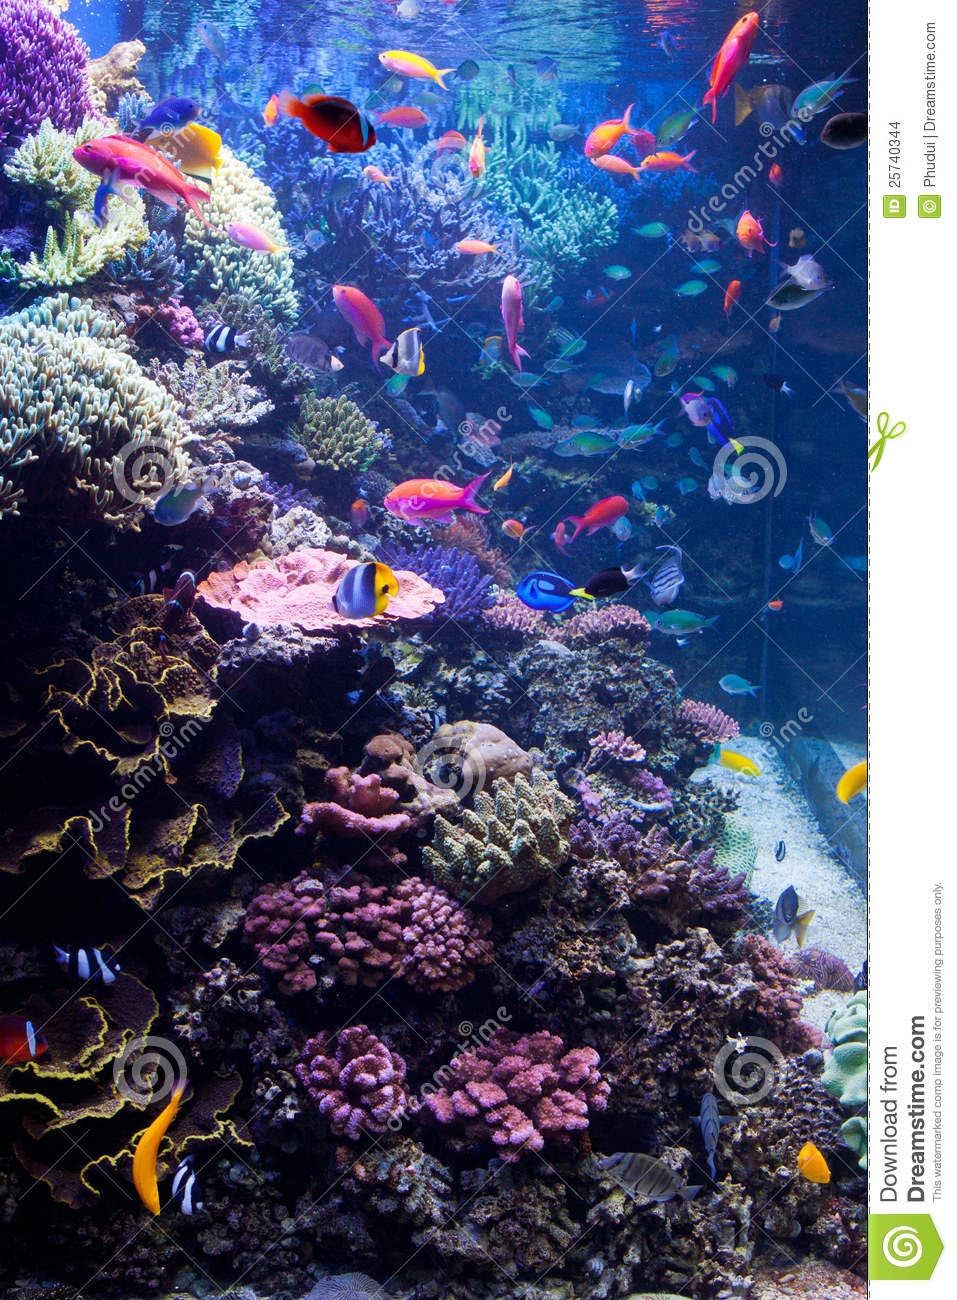 Popular Saltwater Fish for Aquariums